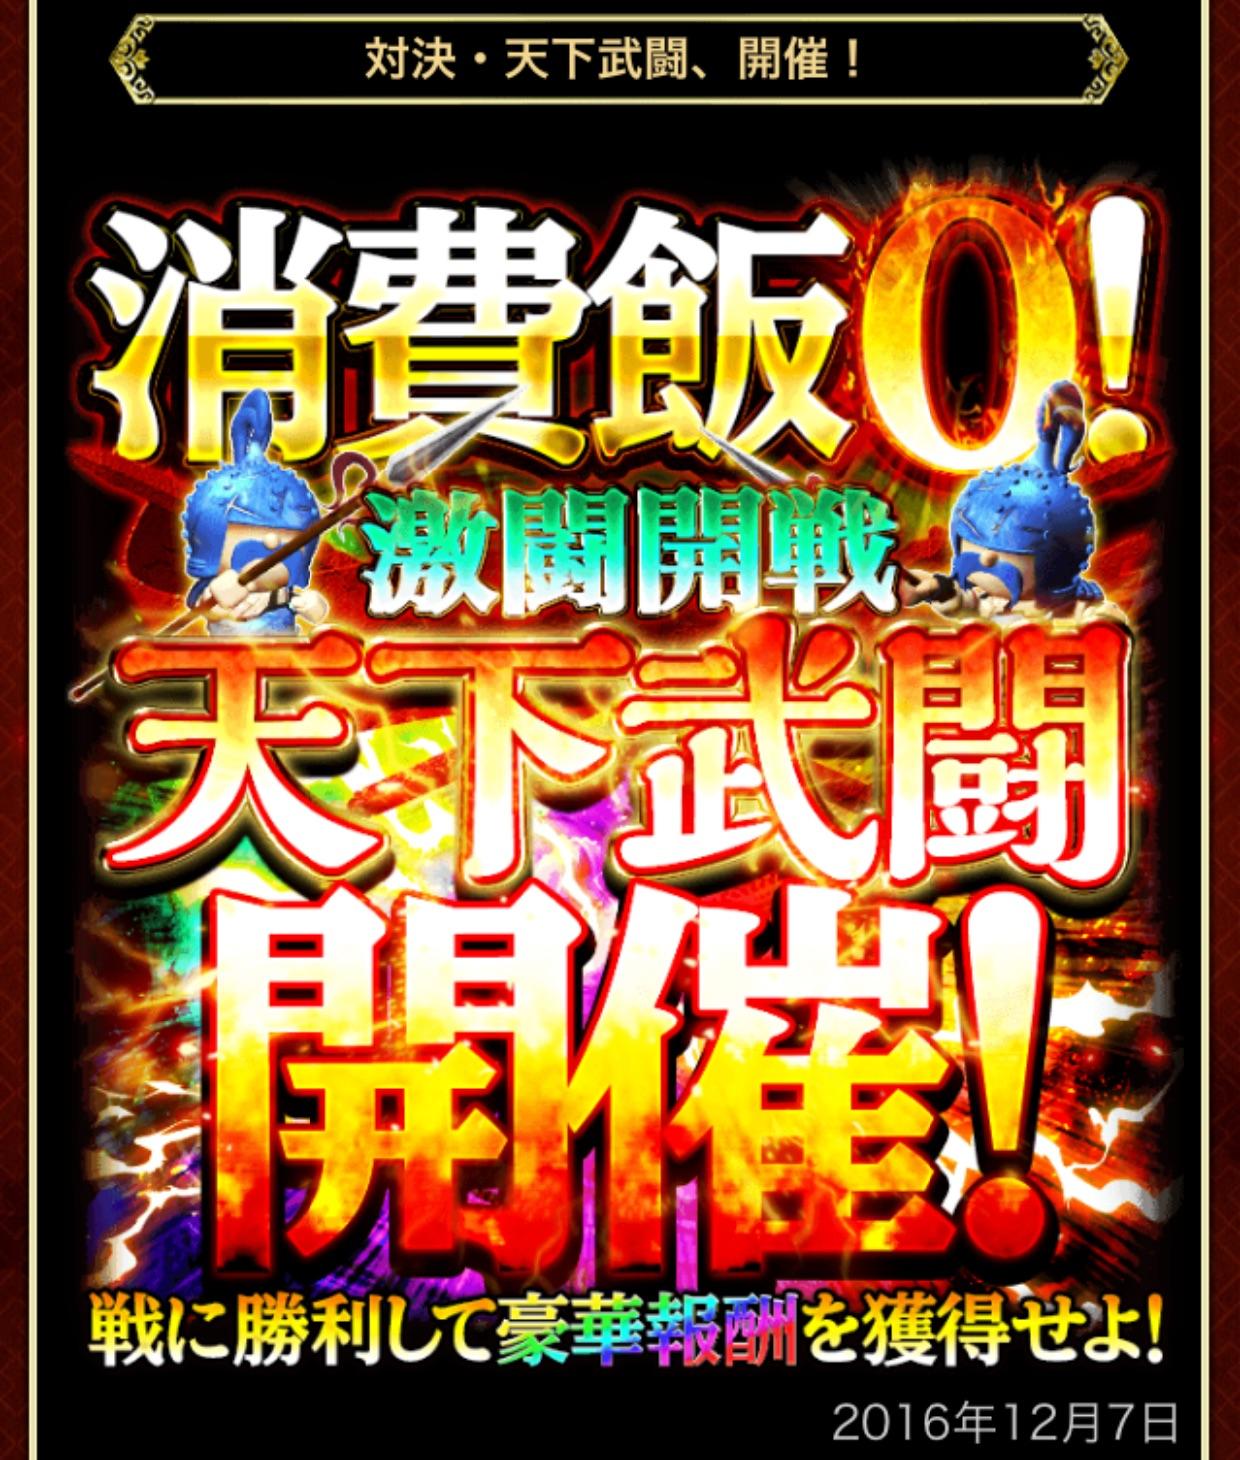 20161209085430fa1.jpg